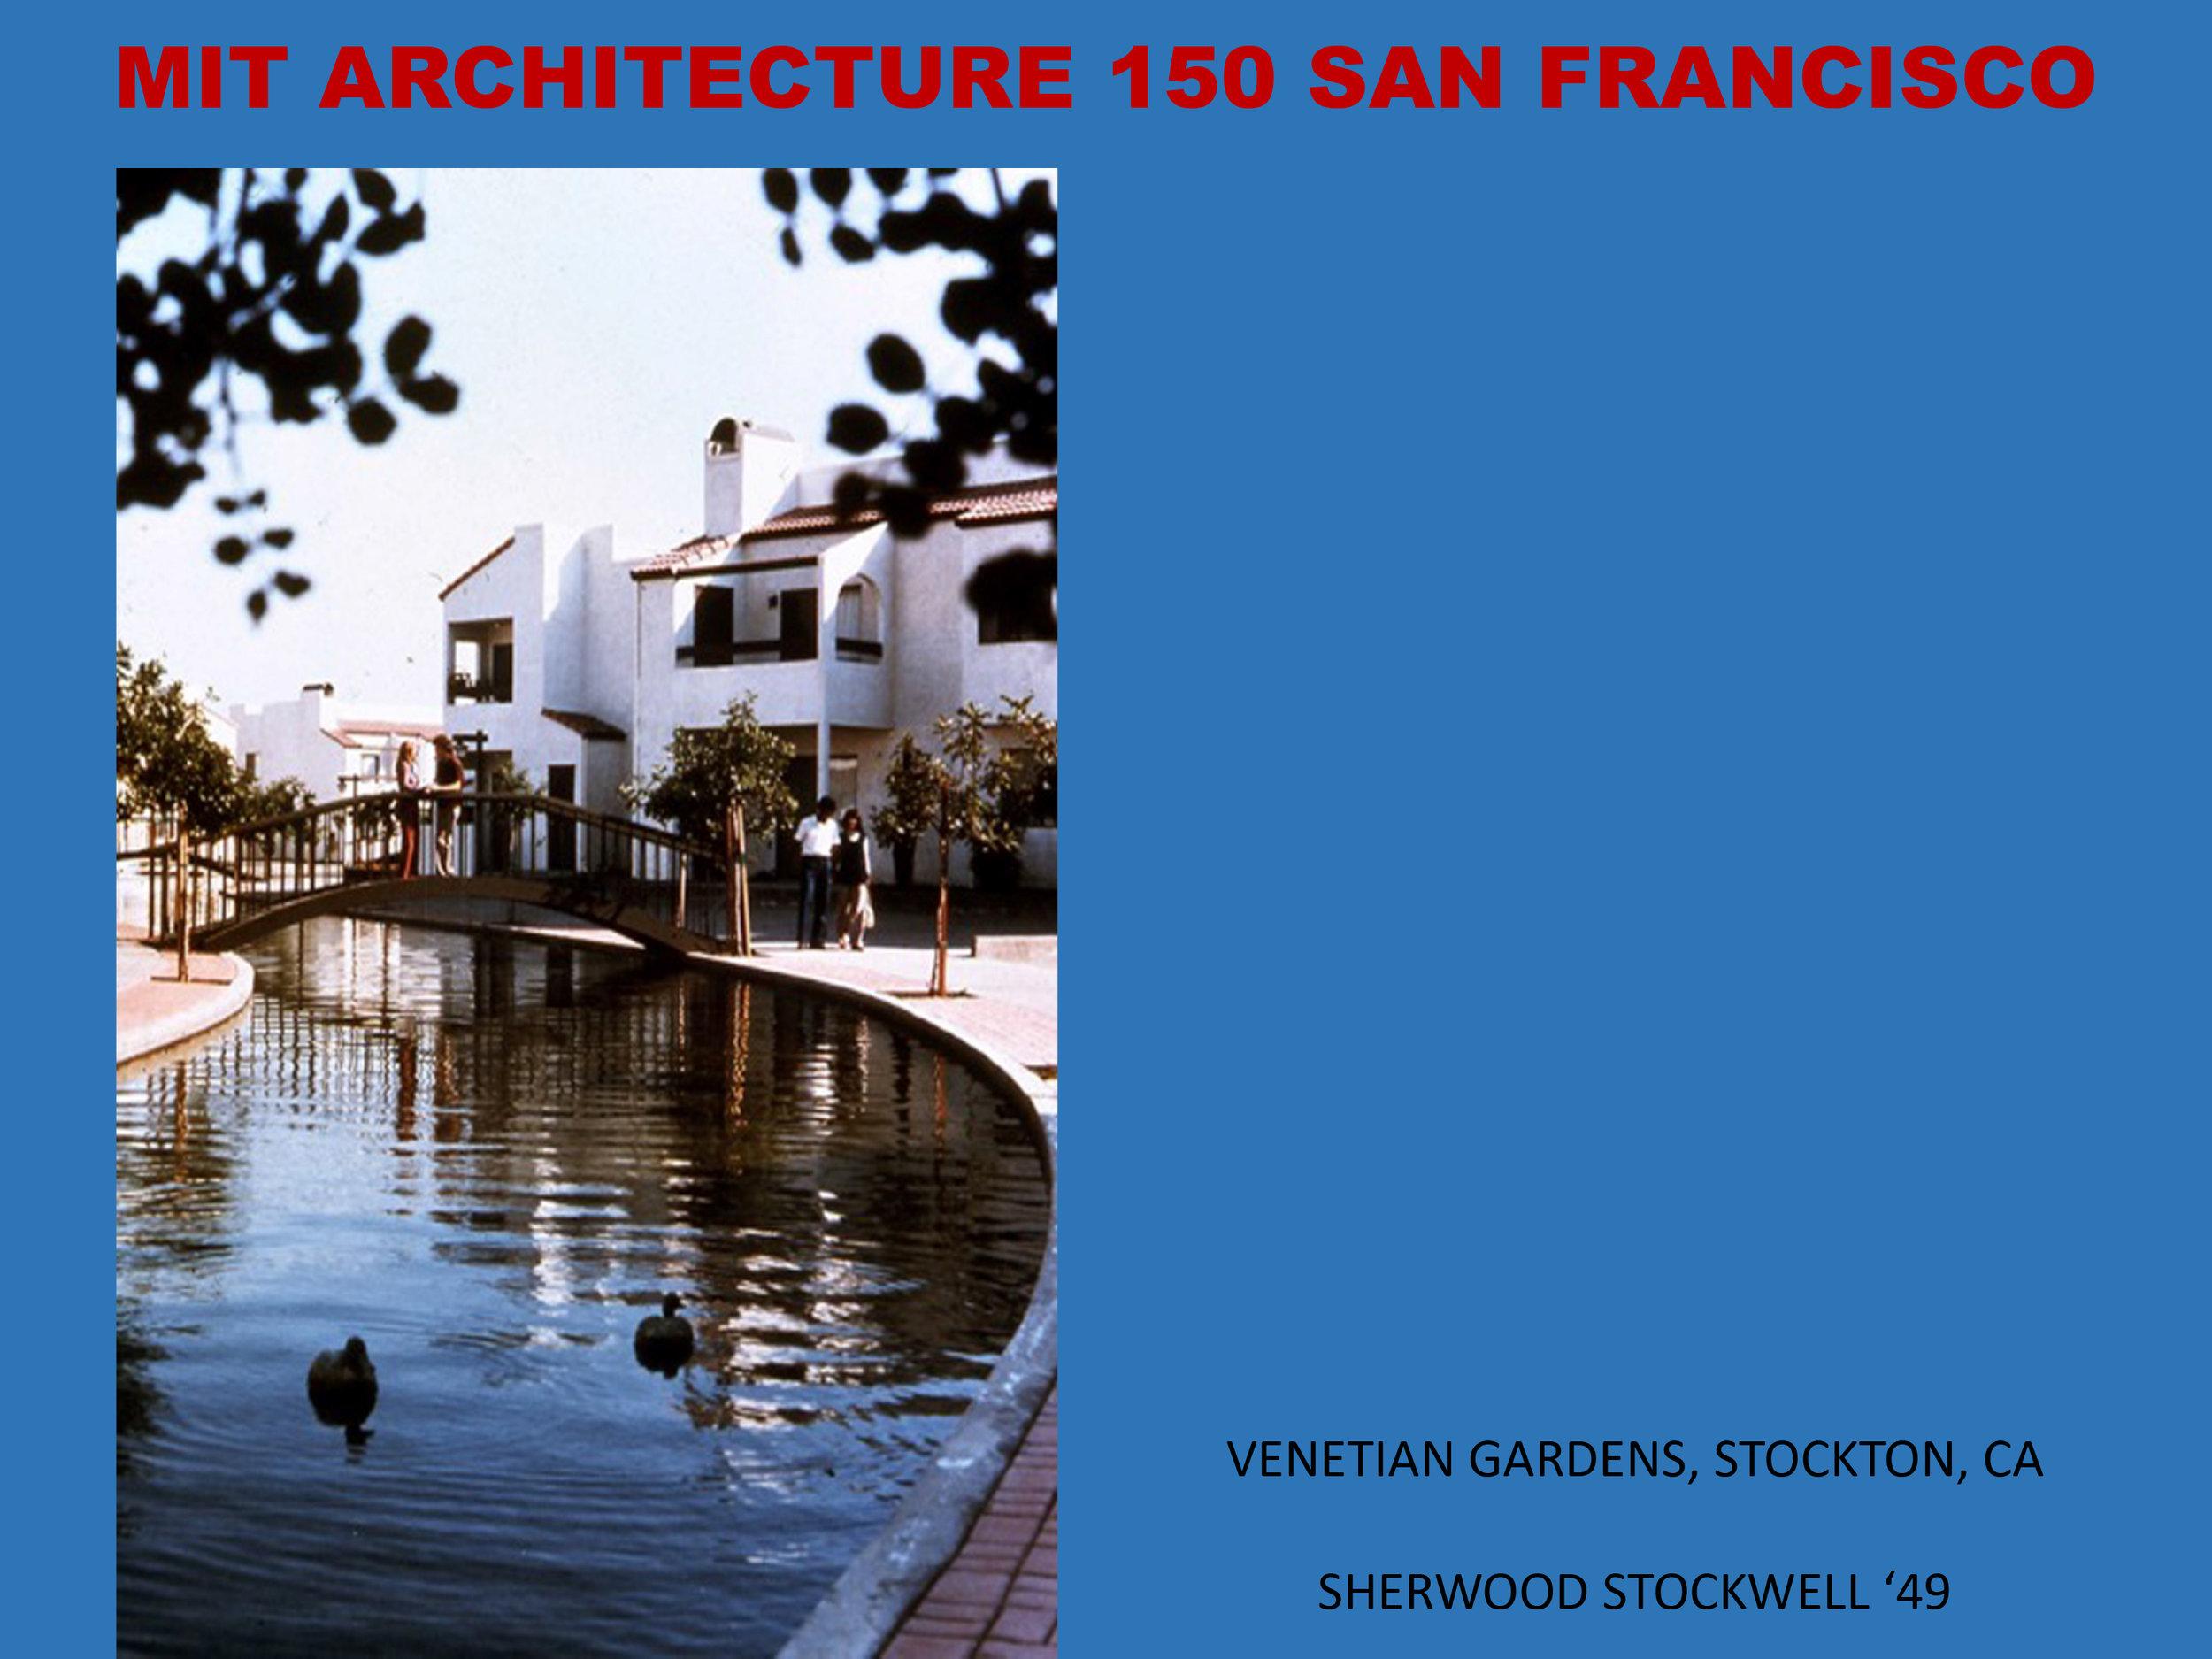 MIT ARCHITECTURE 150 SAN FRANCISCO SLIDESHOW-62 copy.jpg